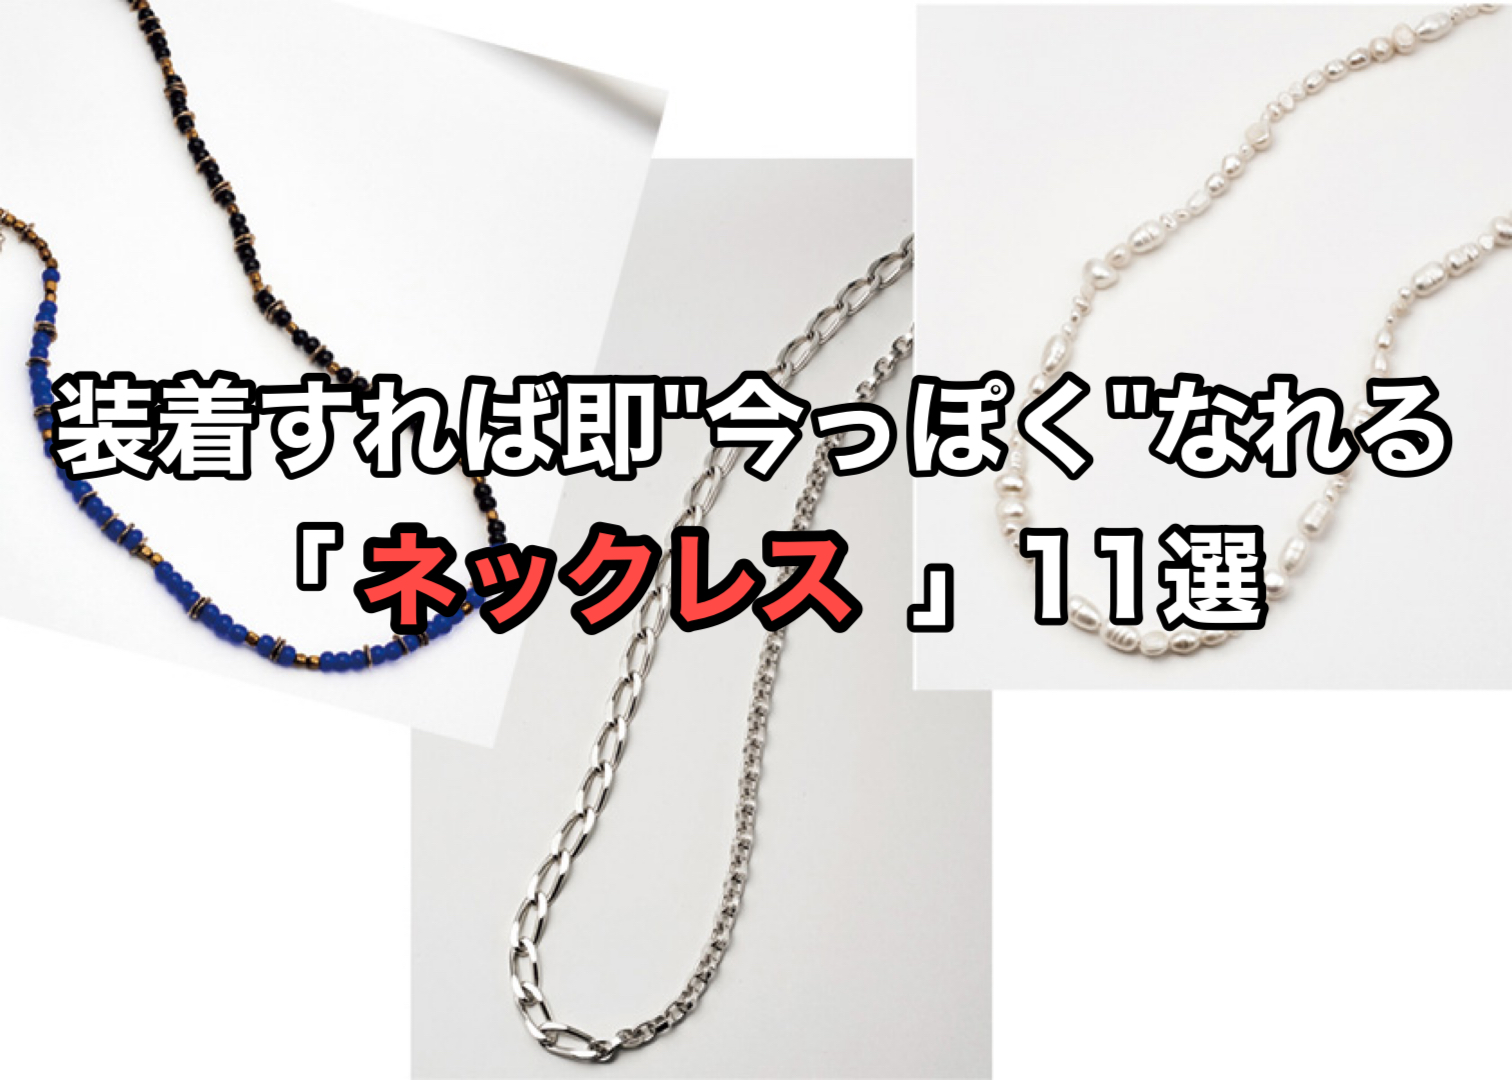 https://cdn.fineboys-online.jp/thegear/content/theme/img/org/article/3461/main.jpg?t=1624848129